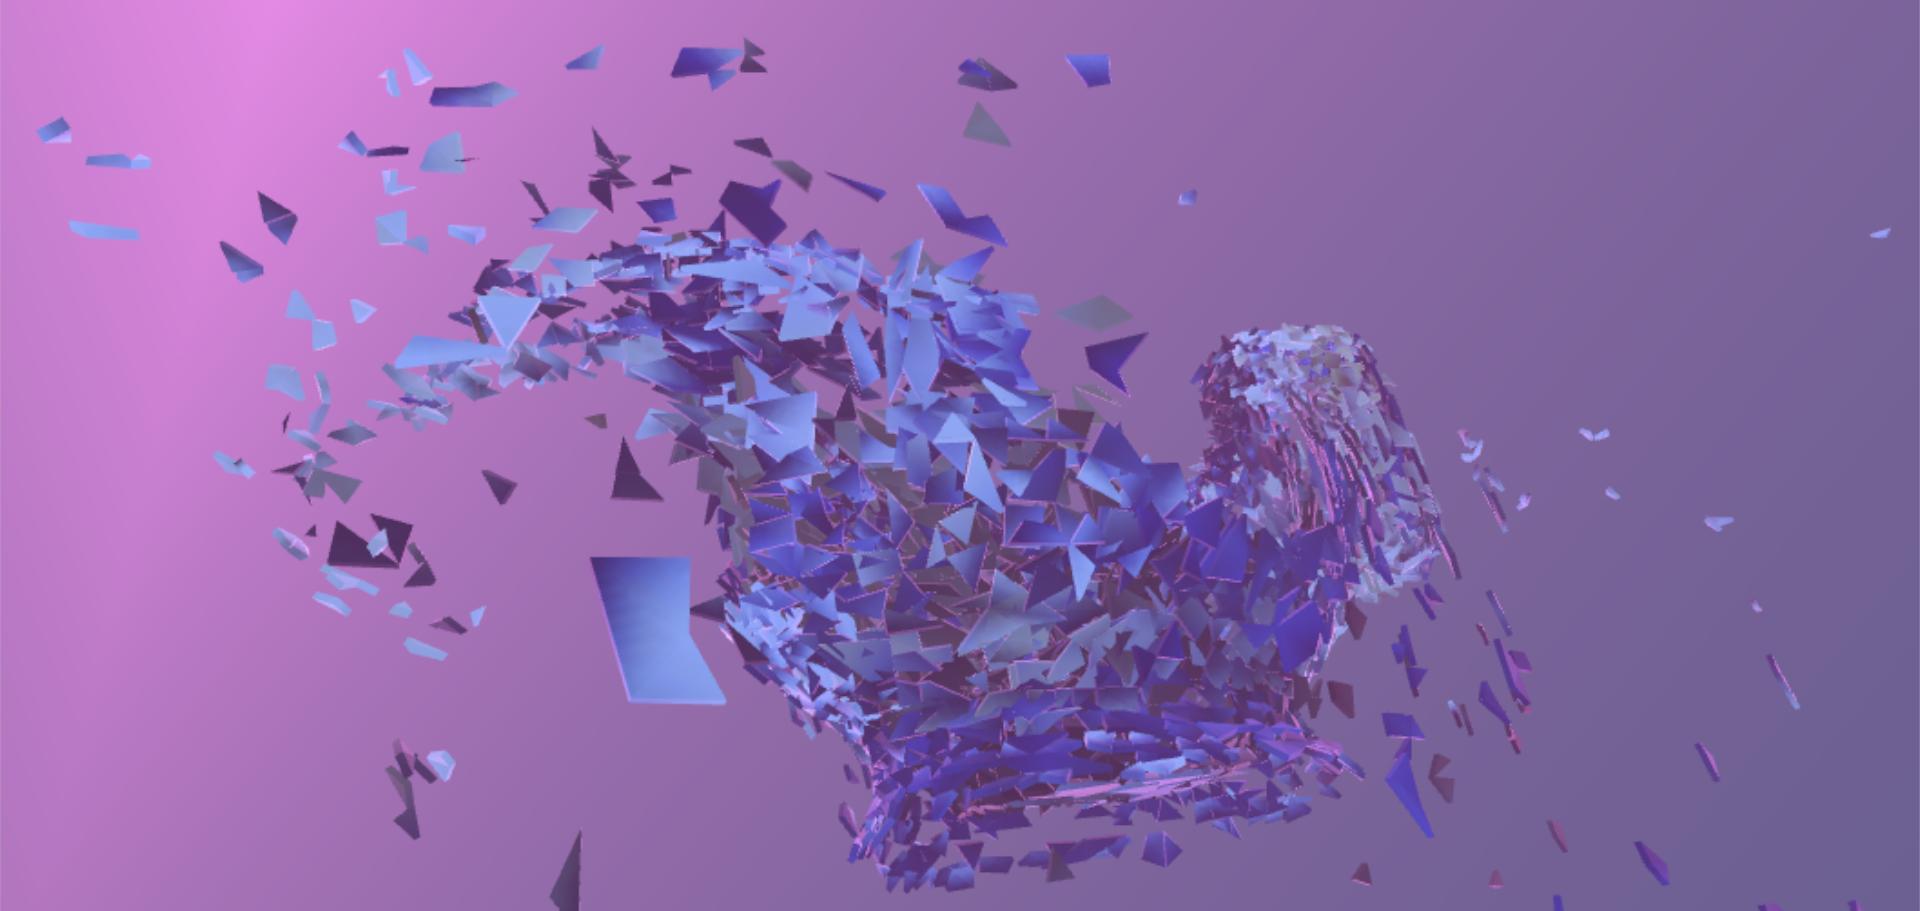 Unity 2018.1.0f2 Personal (64bit) - WeepingAngel2.unity - MazeForArtists - PC, Mac _ Linux Standalone _DX11_ 8_17_2018 10_36_33 AM.png